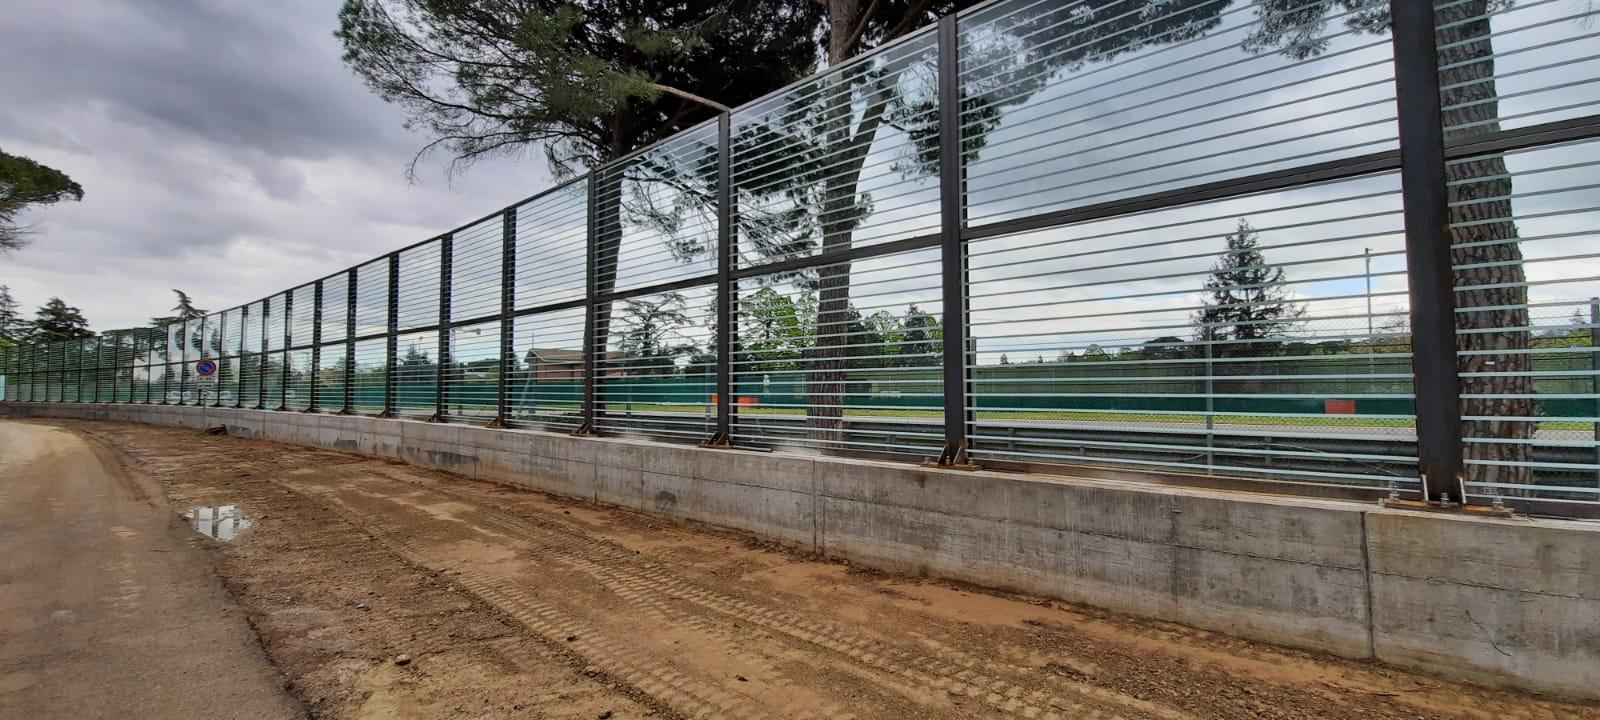 Barriera antirumore in vetro stratificato